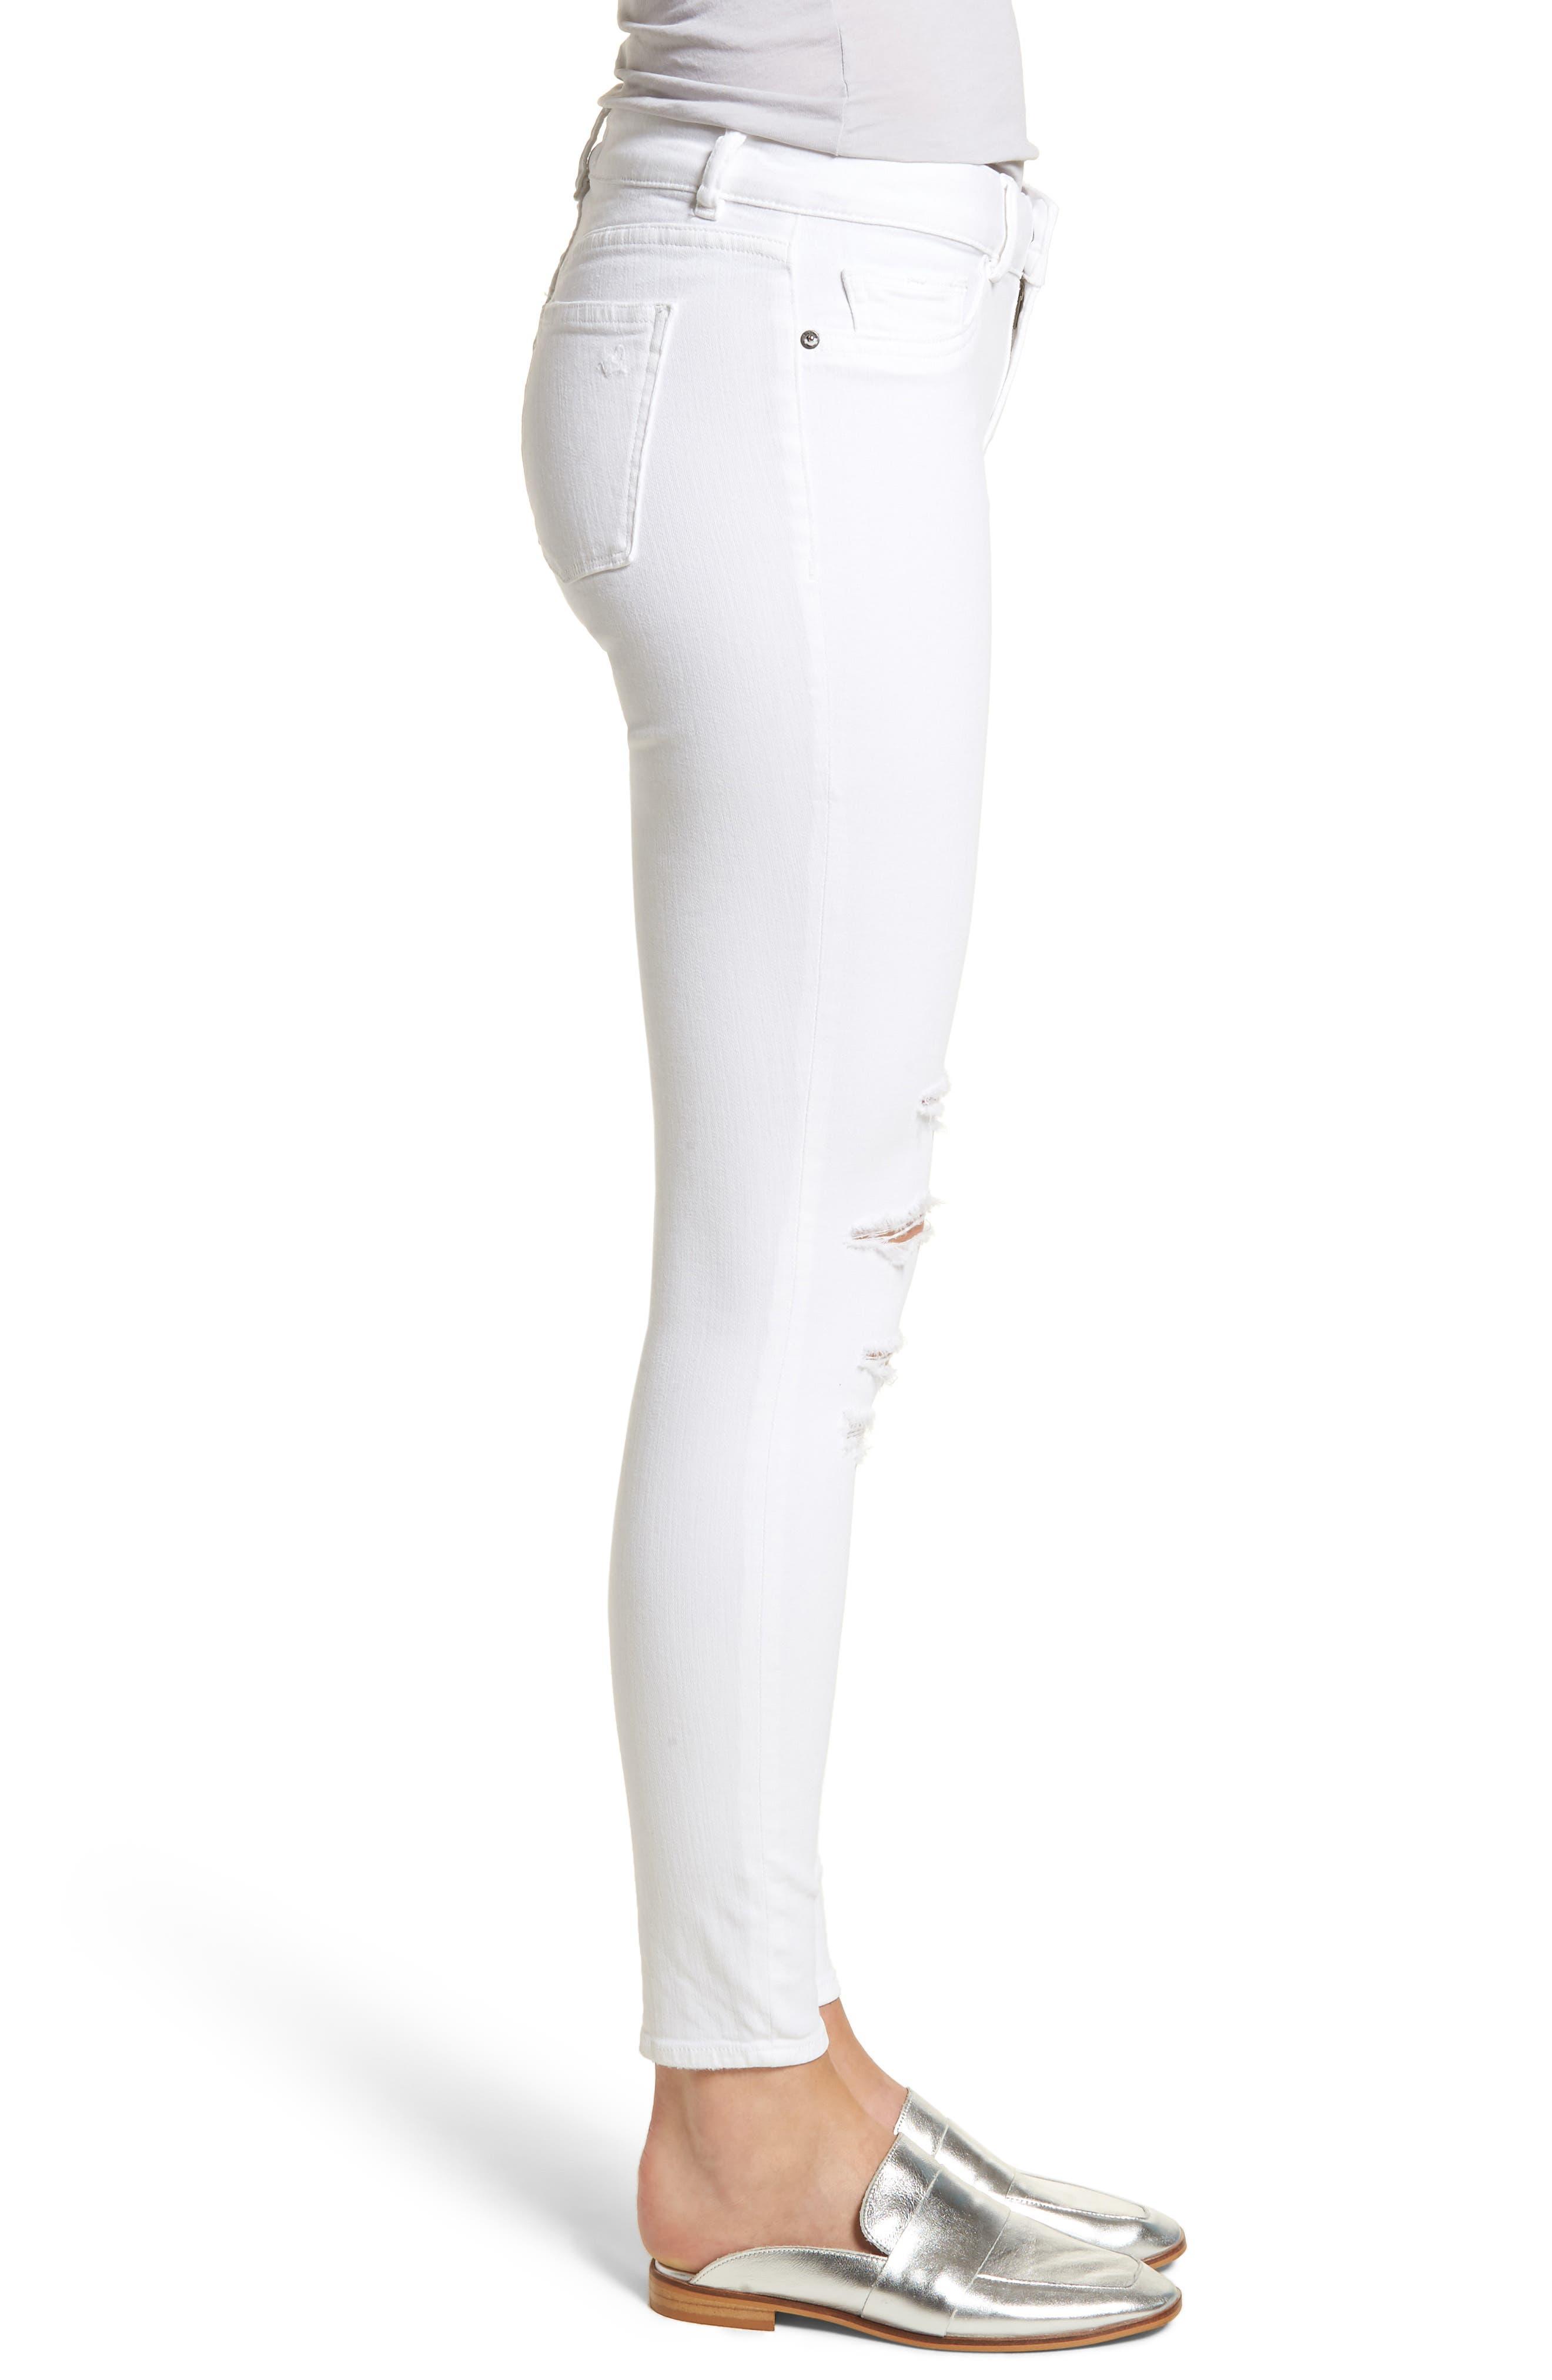 Emma Power Legging Jeans,                             Alternate thumbnail 3, color,                             100